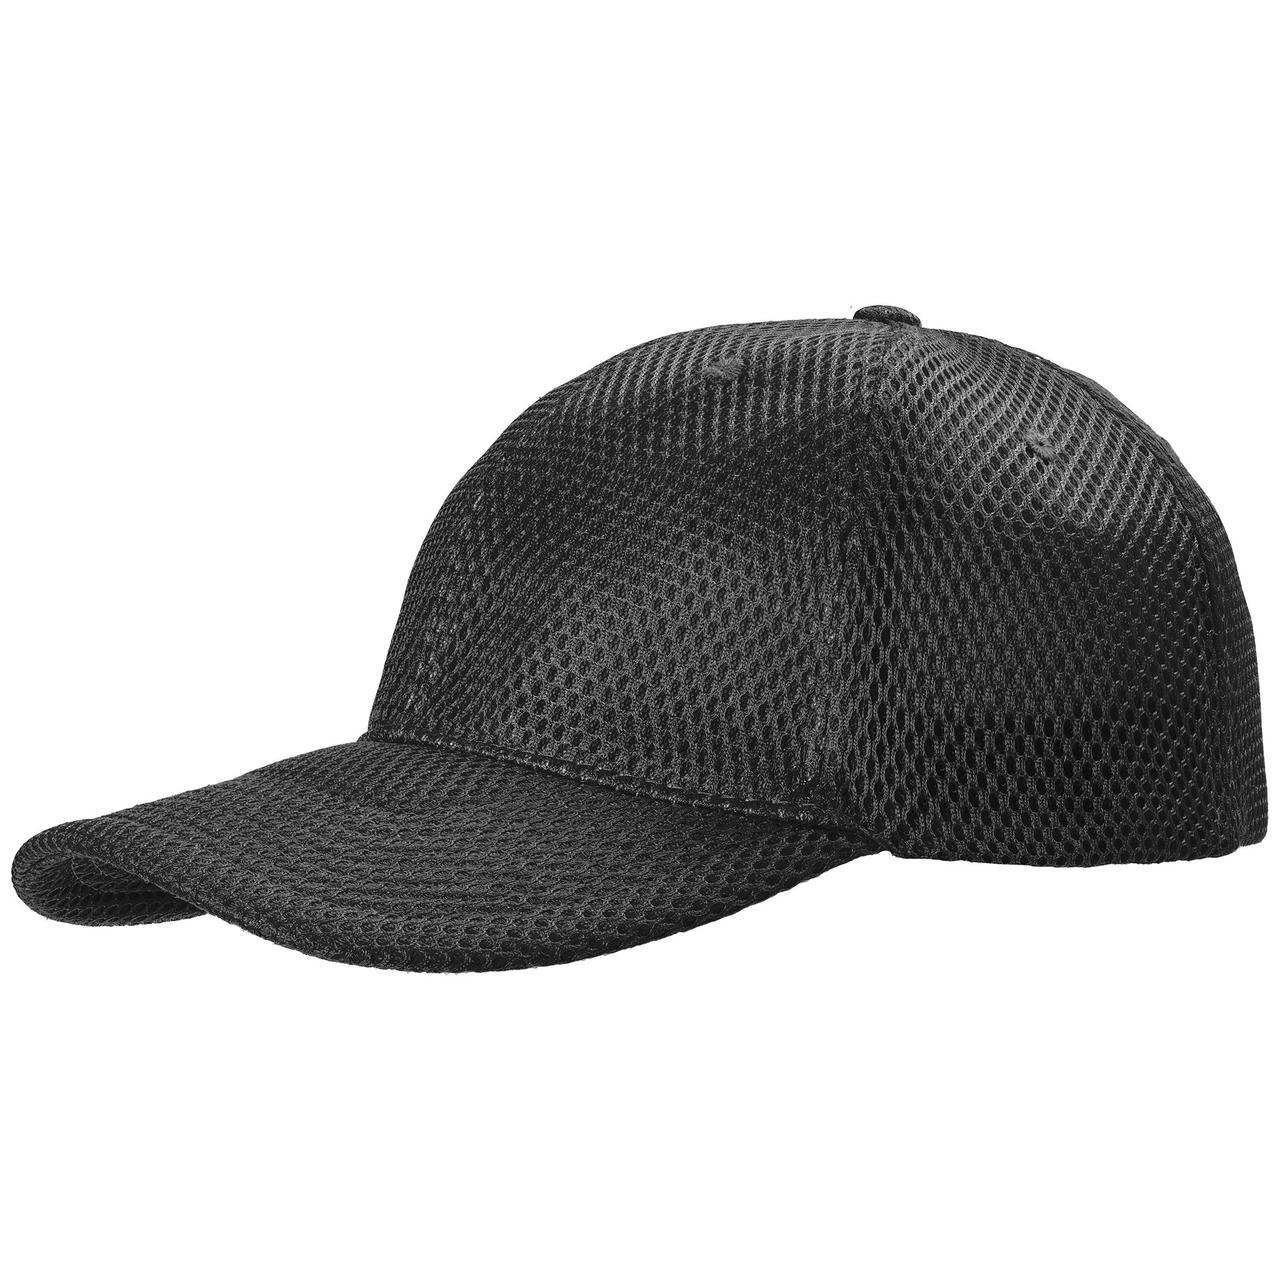 Бейсболка Ben More, черная (артикул 7259.30)